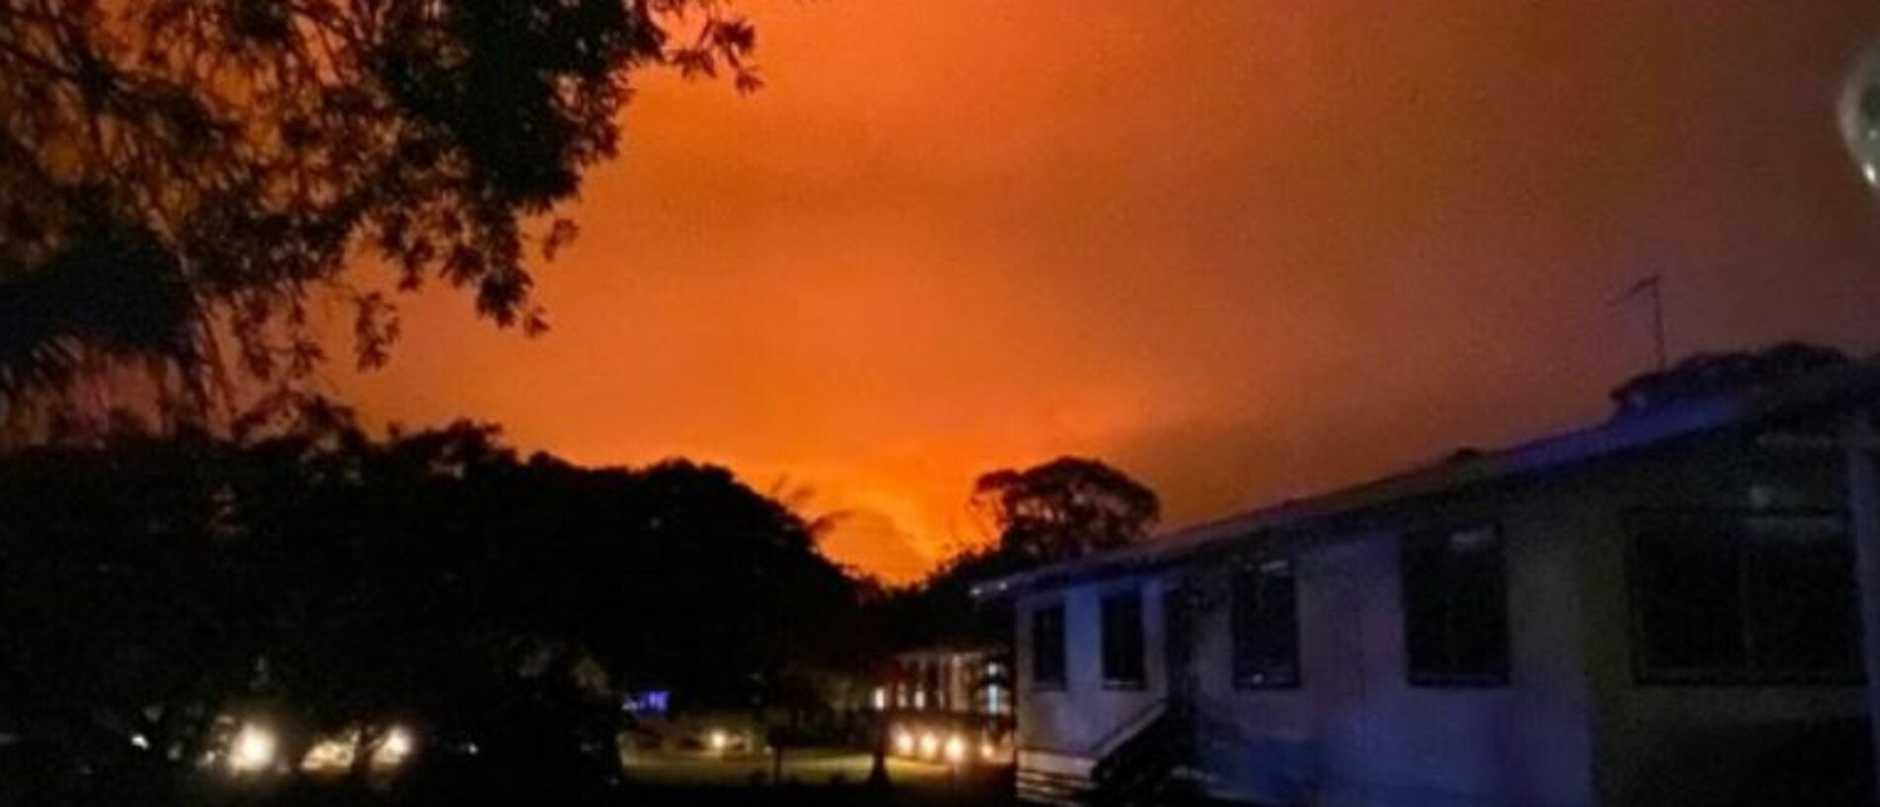 Tanya Jenness captured this image at Branyan, near Bundaberg, overnight.